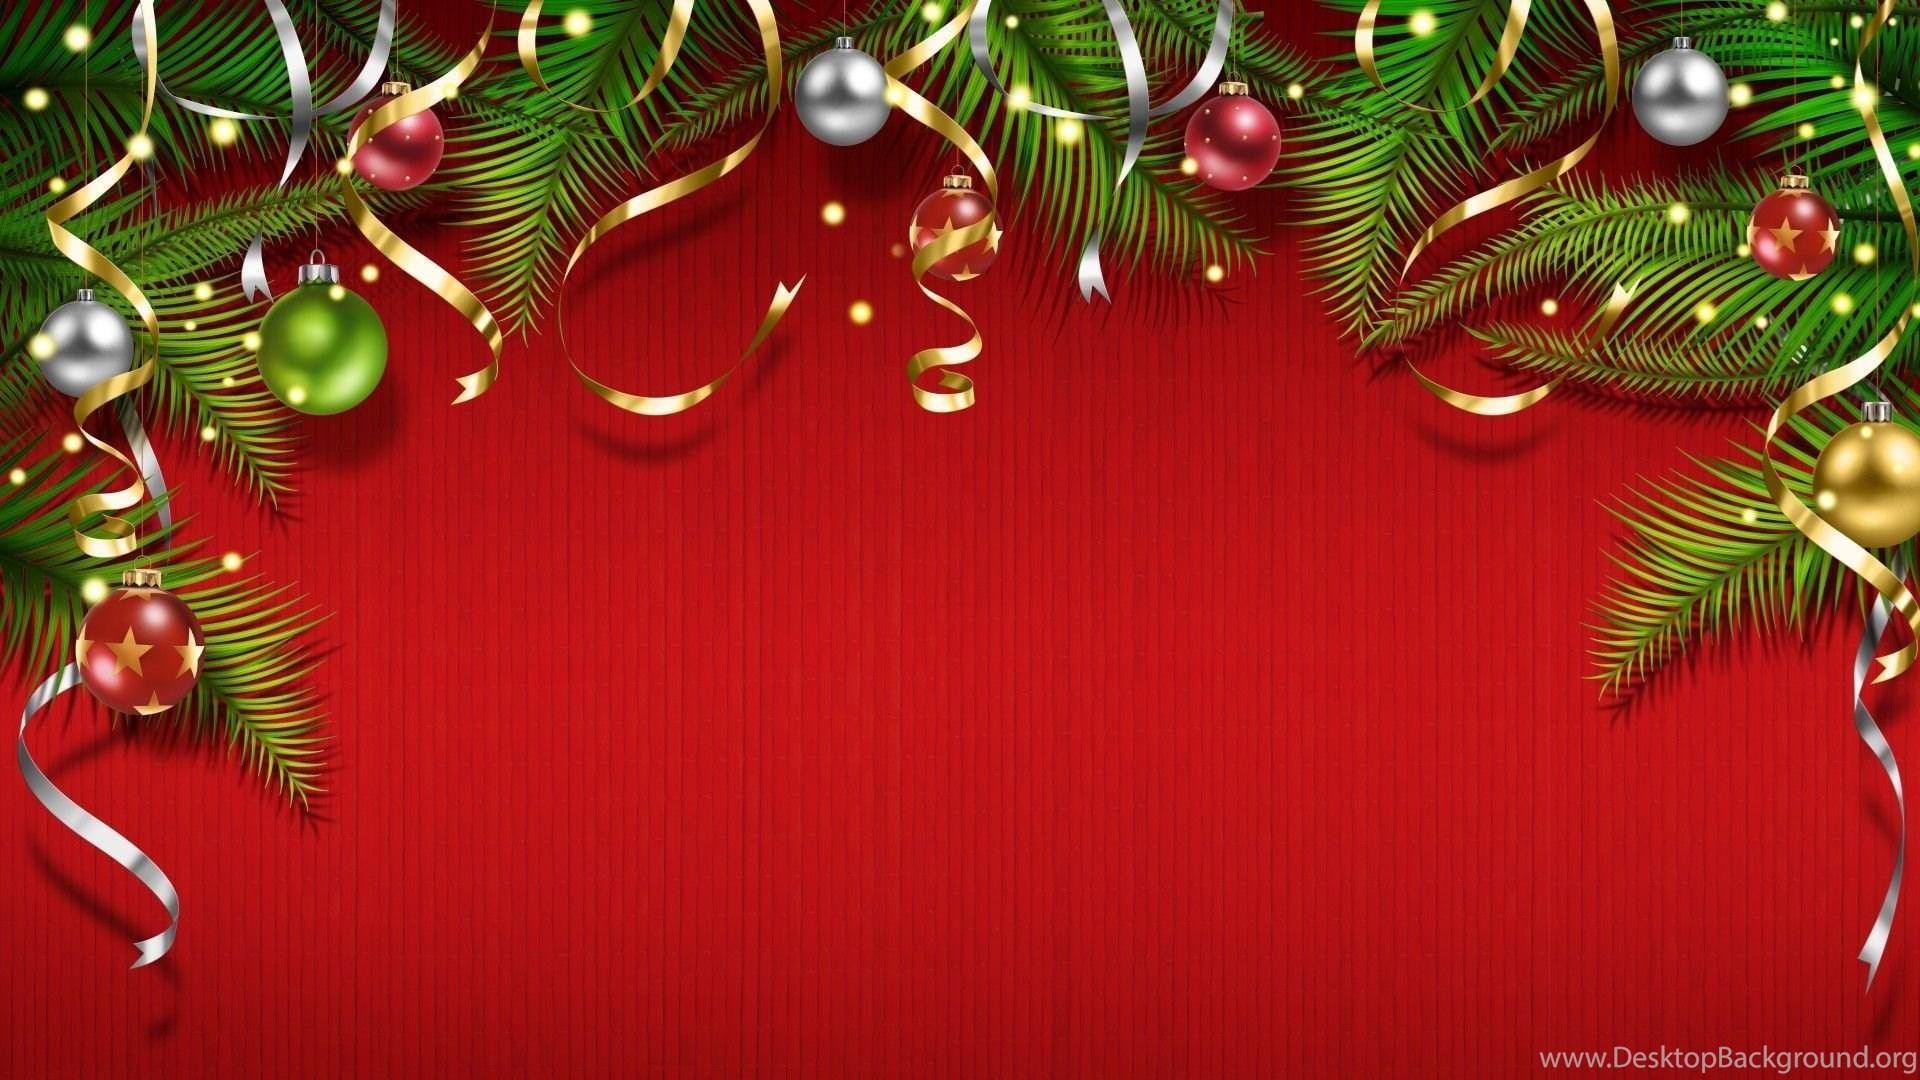 77 772959 christmas wallpapers hd 1920x1080 free wallpapers christmas greetings